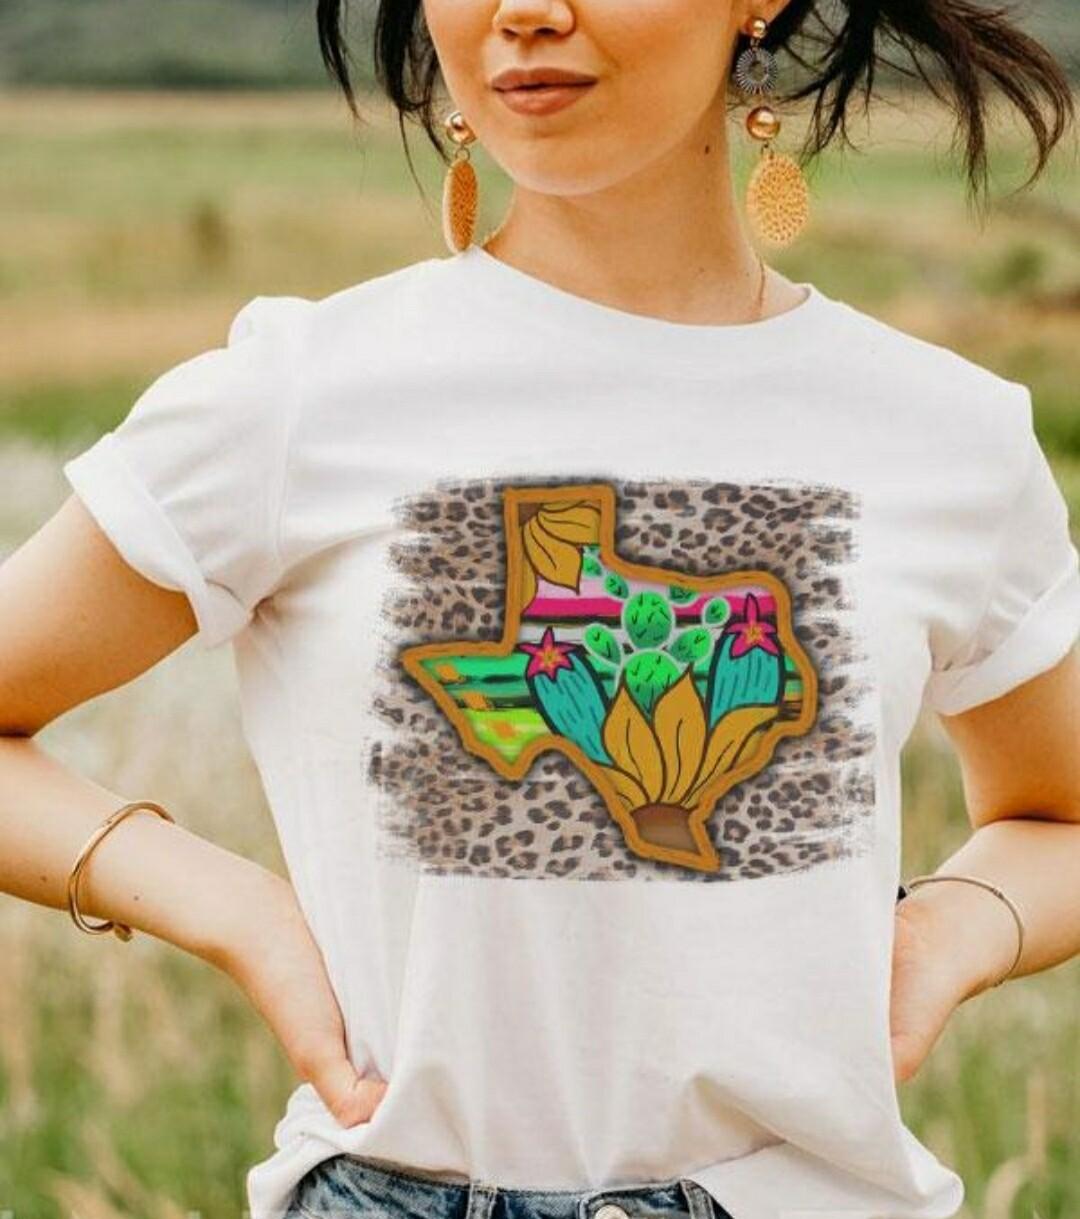 White & Leopard Texas Cactus Shirt